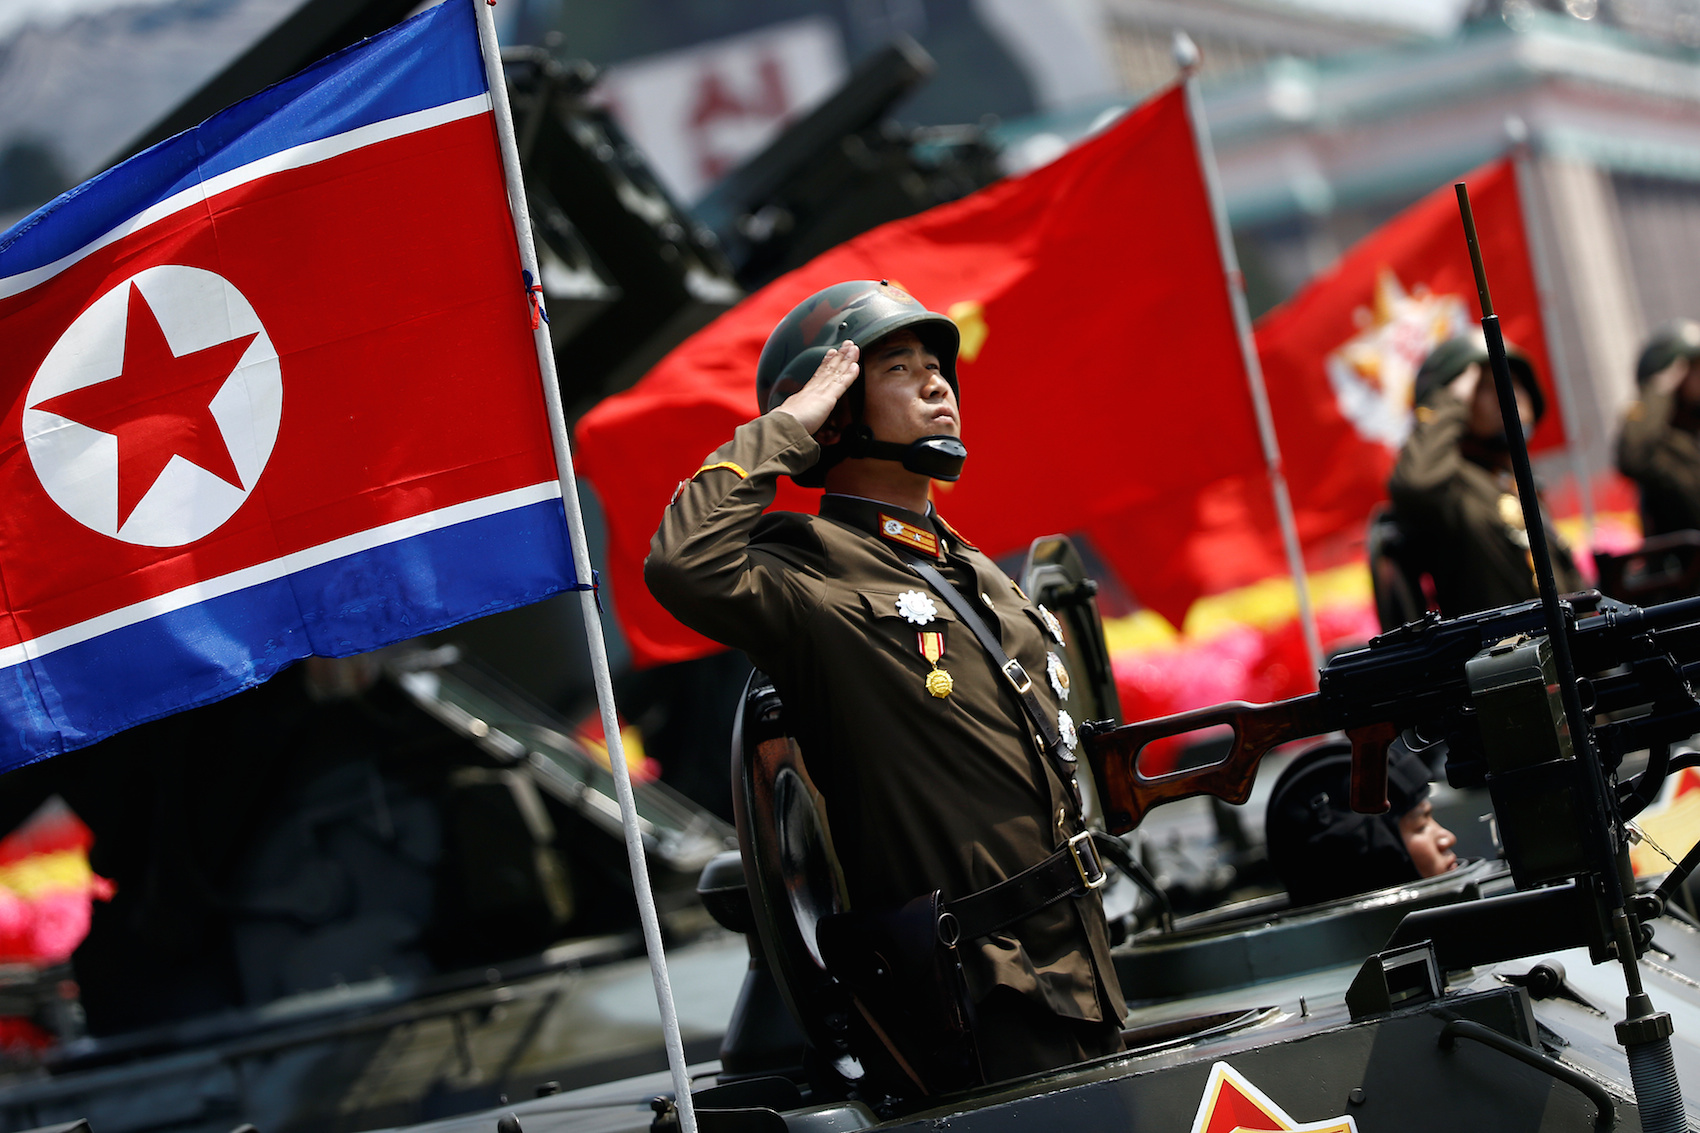 A soldier salutes during a military parade in Pyongyang April 15, 2017. Reuters/Damir Sagolj